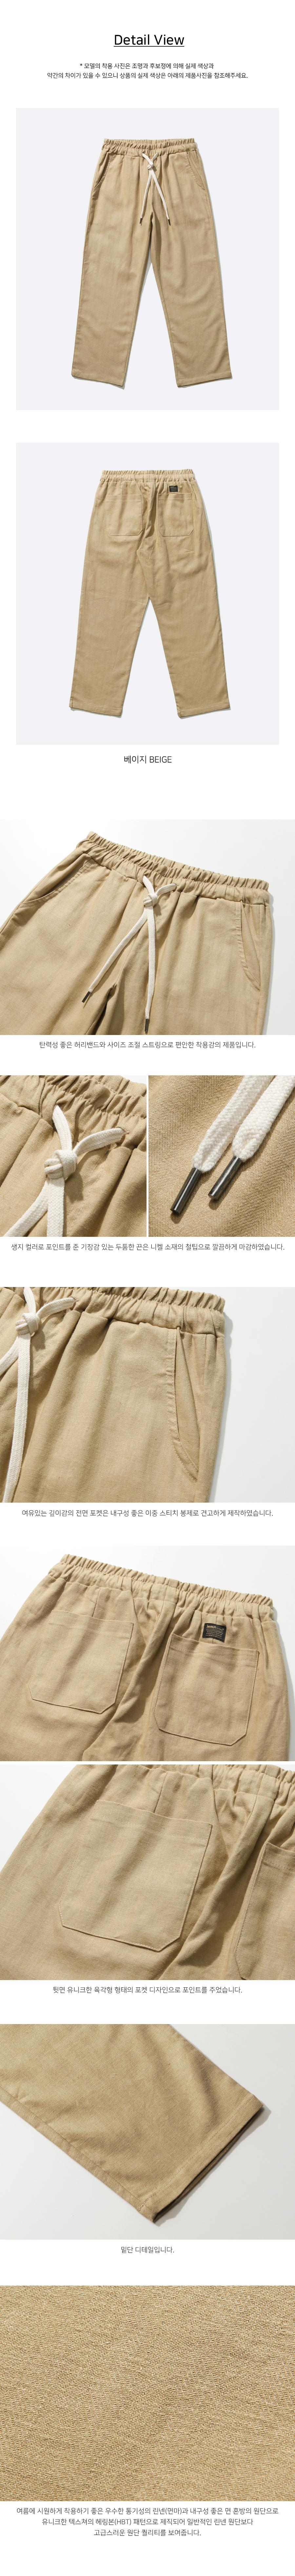 HJLP2122_detail_beige_kj.jpg